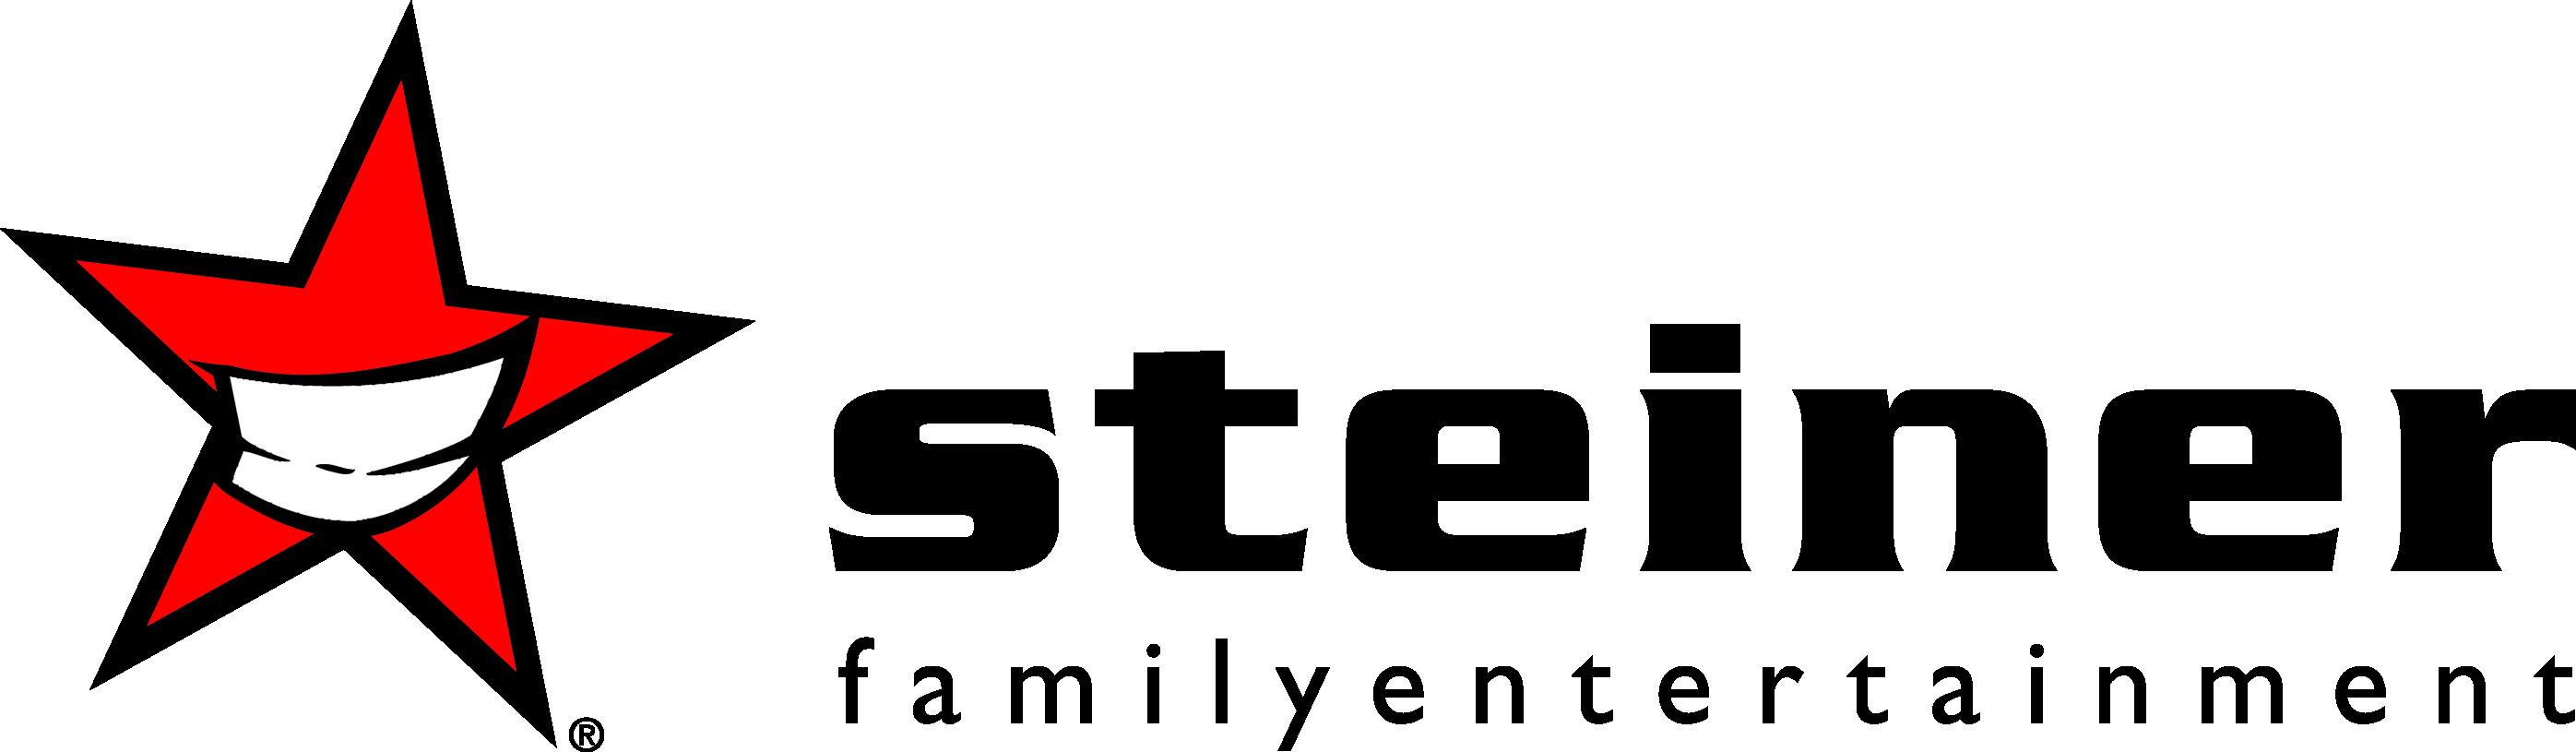 STEINER Familyentertainment